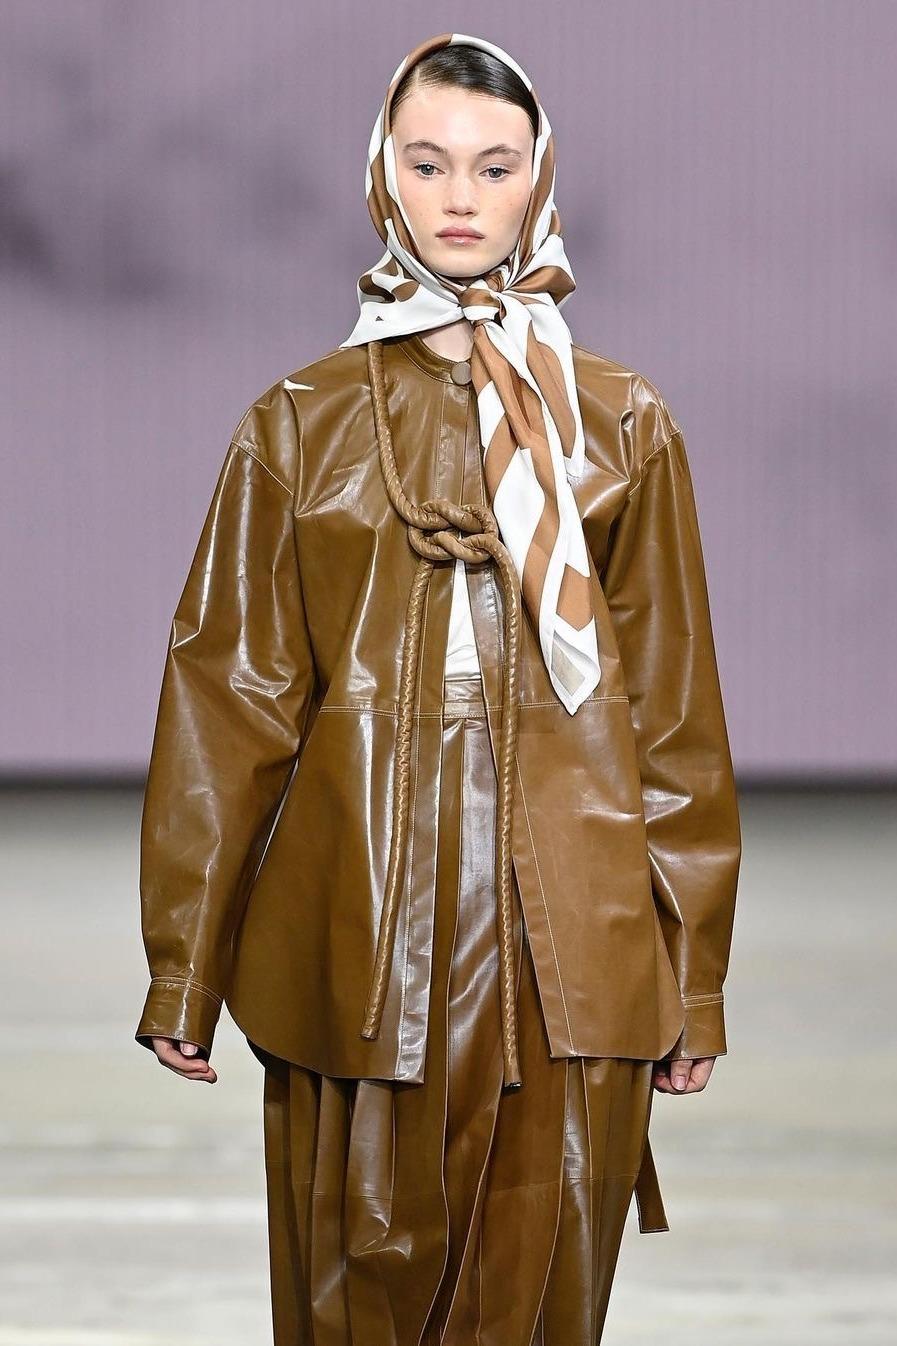 Grace Monfries walks for Next Gen at Australian Fashion Week | Pride Models news